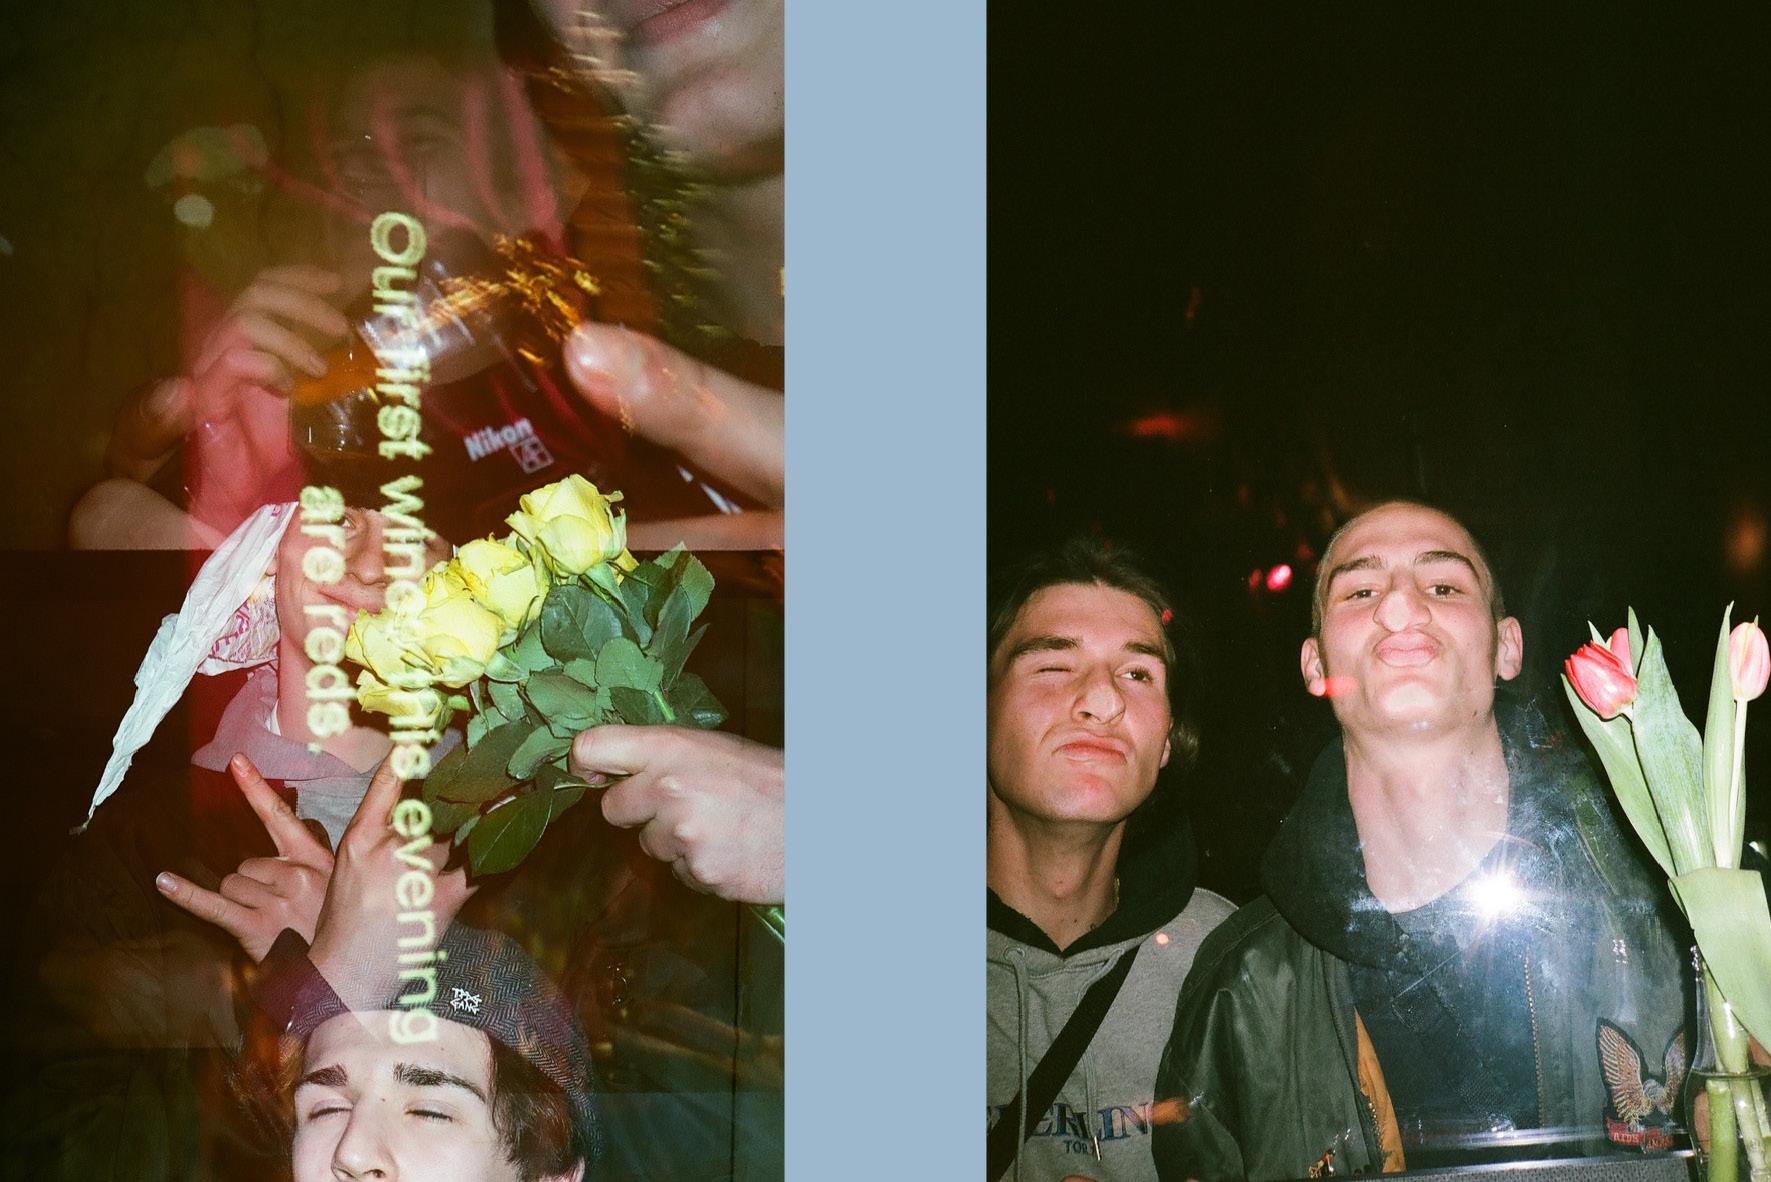 PLACE_kaffeezigarette_partyblumen5